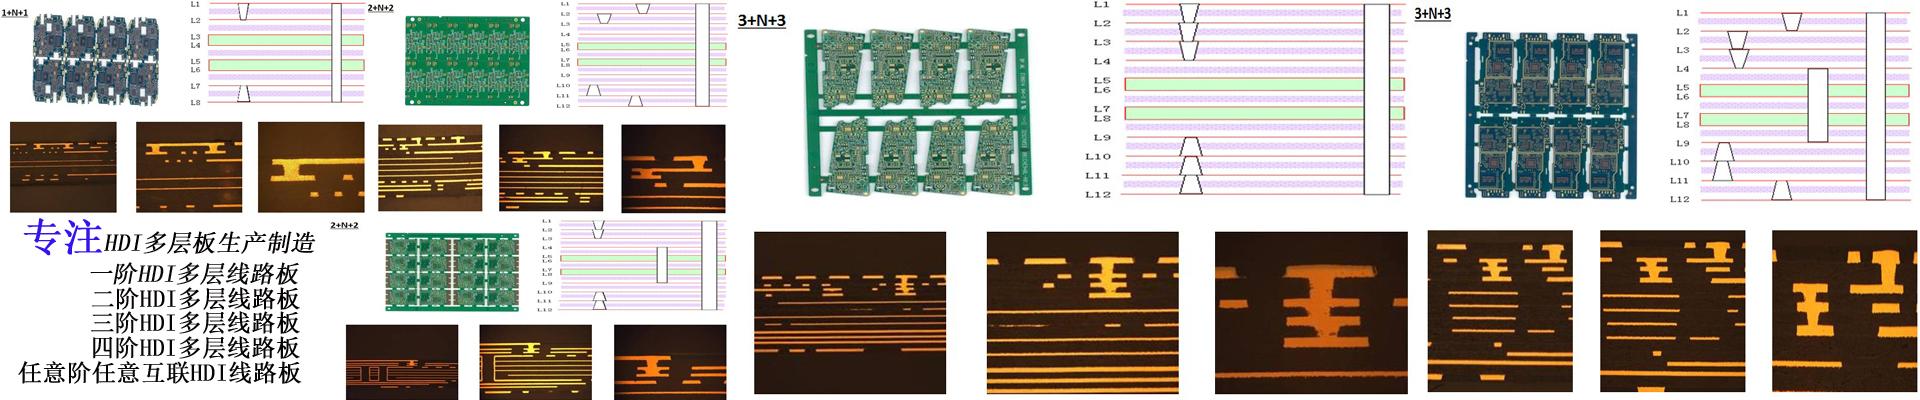 三阶HDI电路板